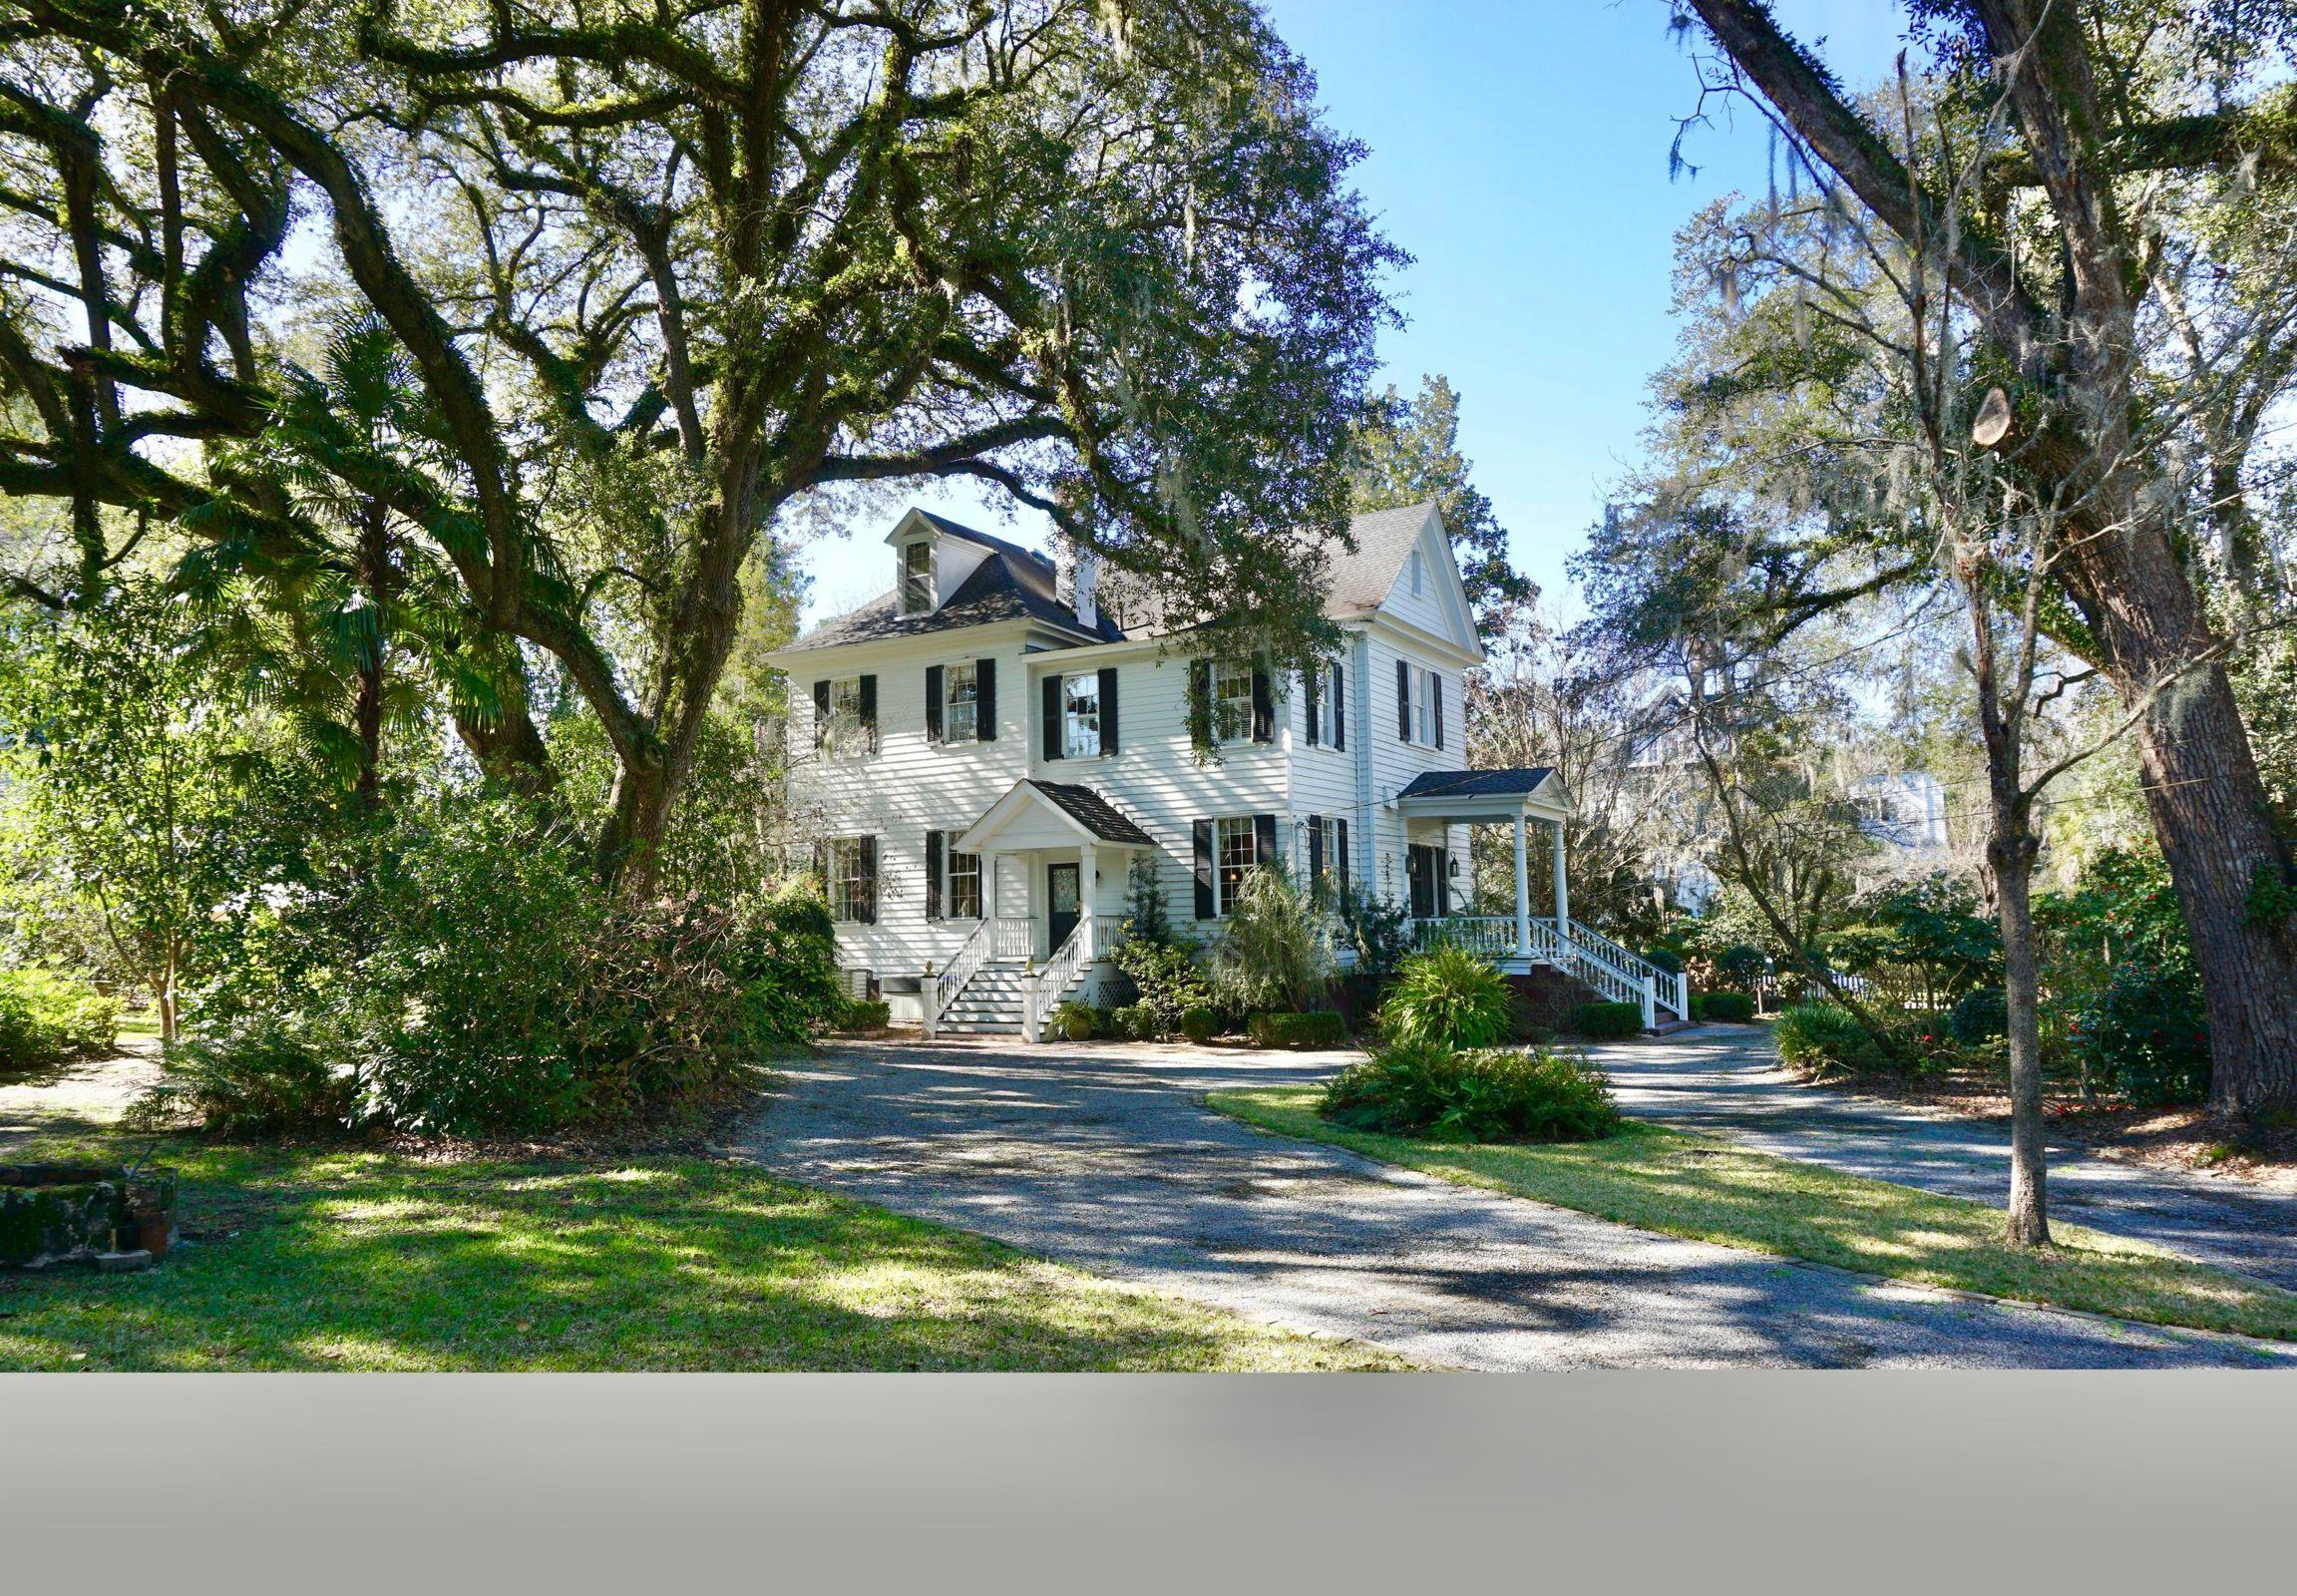 205 Sumter Avenue, Summerville, 29483, 4 Bedrooms Bedrooms, ,4 BathroomsBathrooms,Residential,For Sale,Sumter,21004067